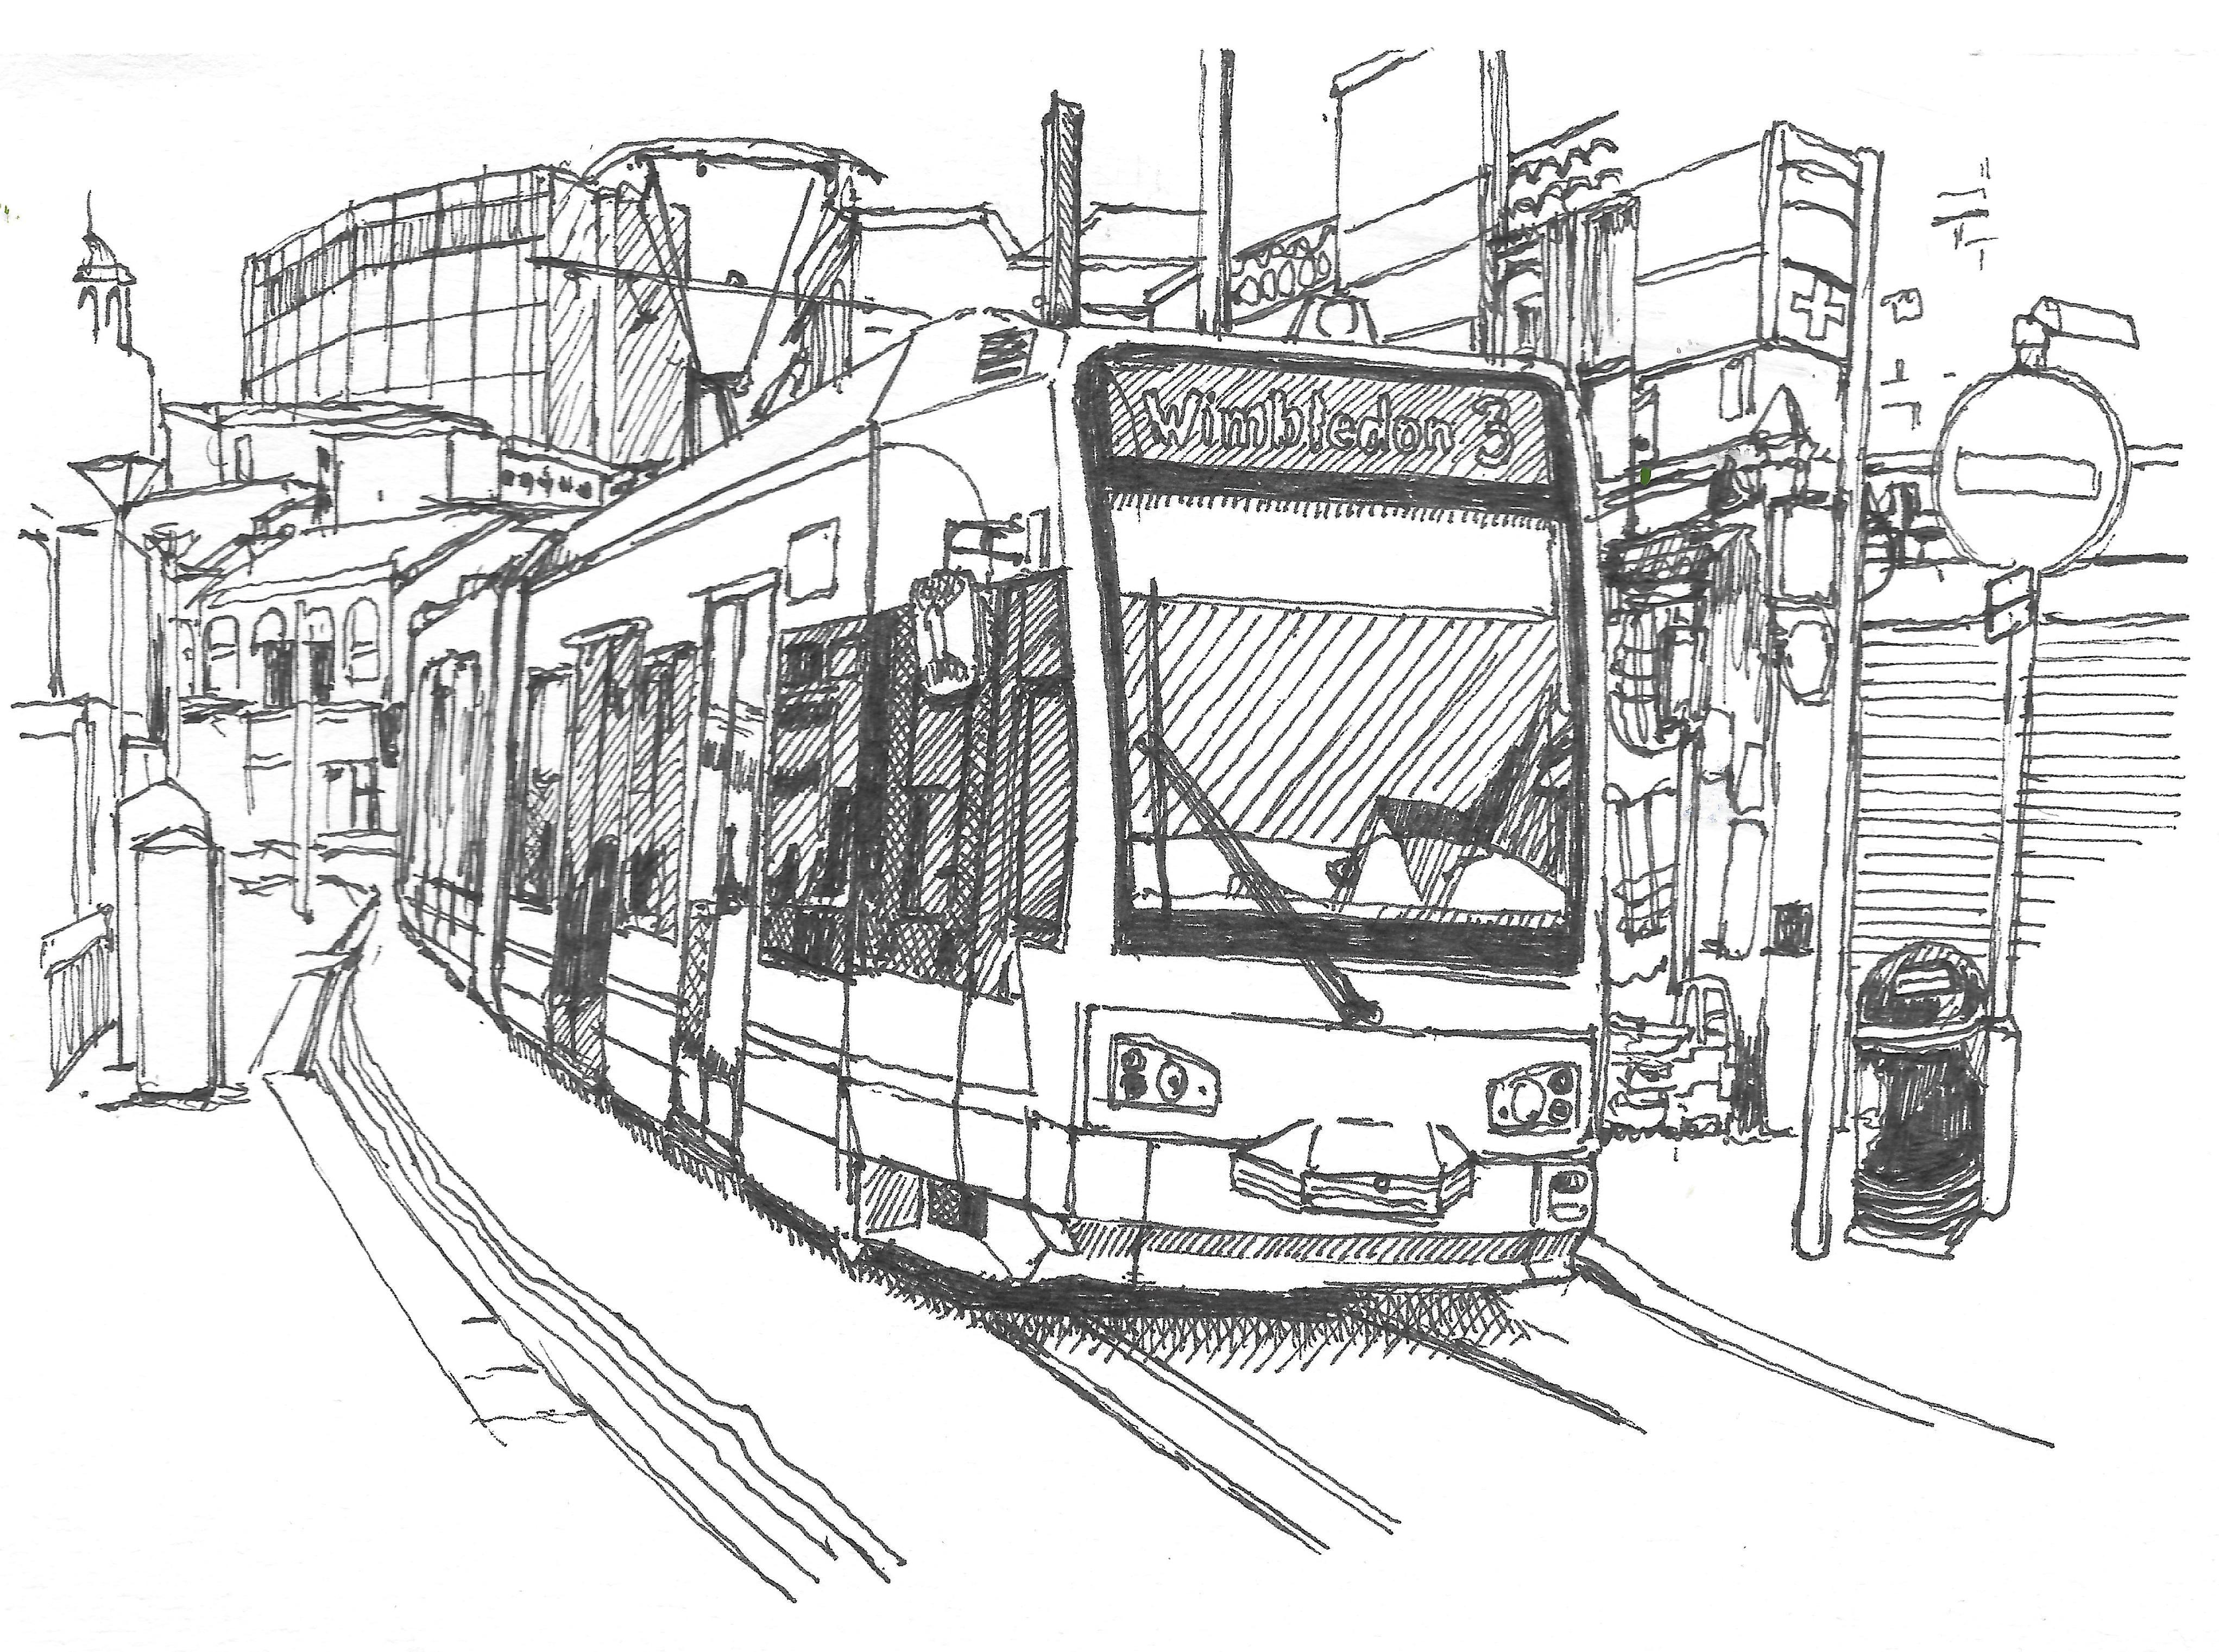 London Tramlink Tram Sketched With 0 3mm Pen Kleurplaten Tekenen